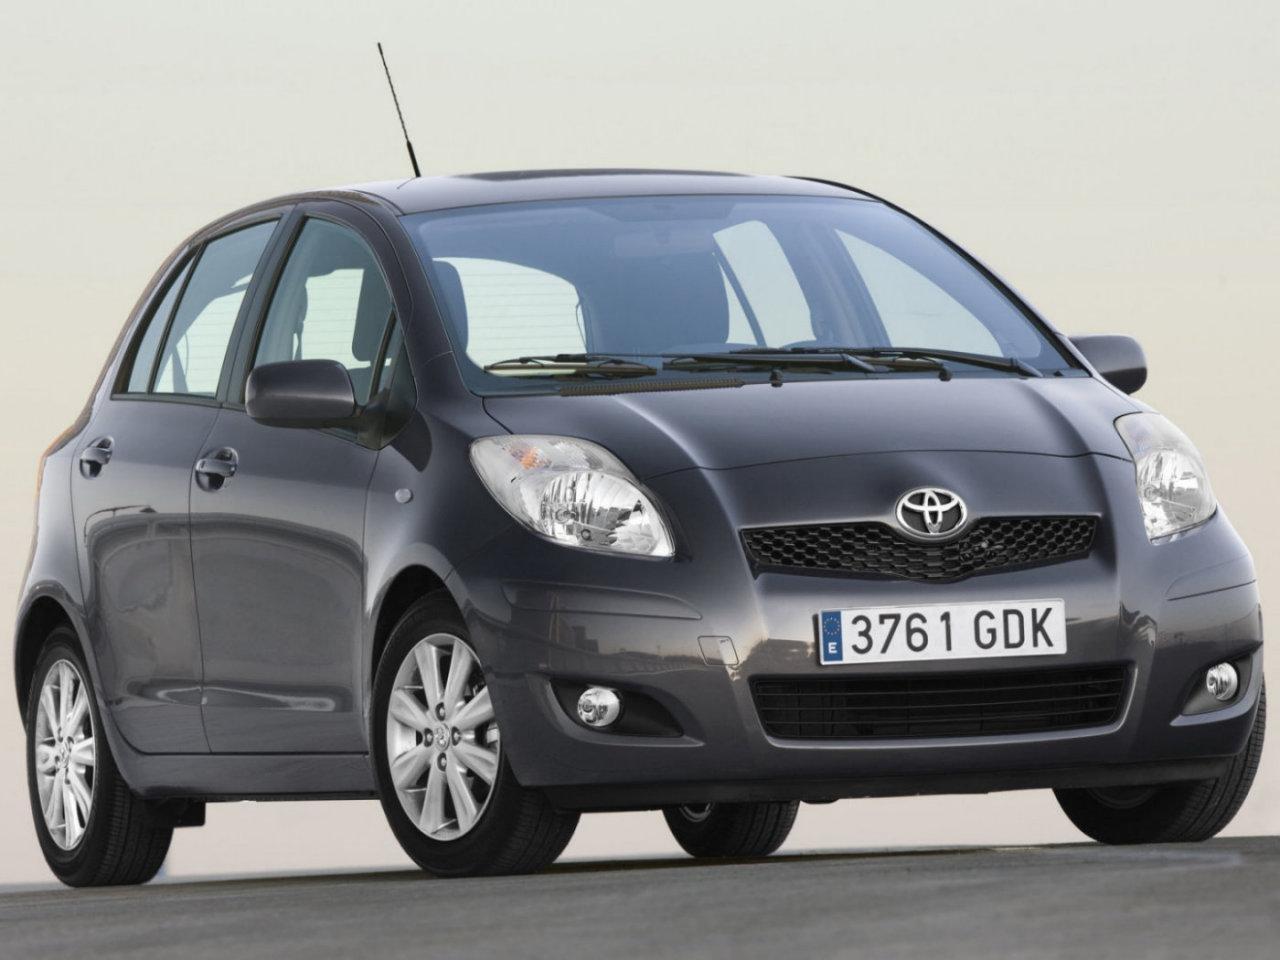 Toyota Yaris 1.3 2SZ-FE Denso 89663-52822